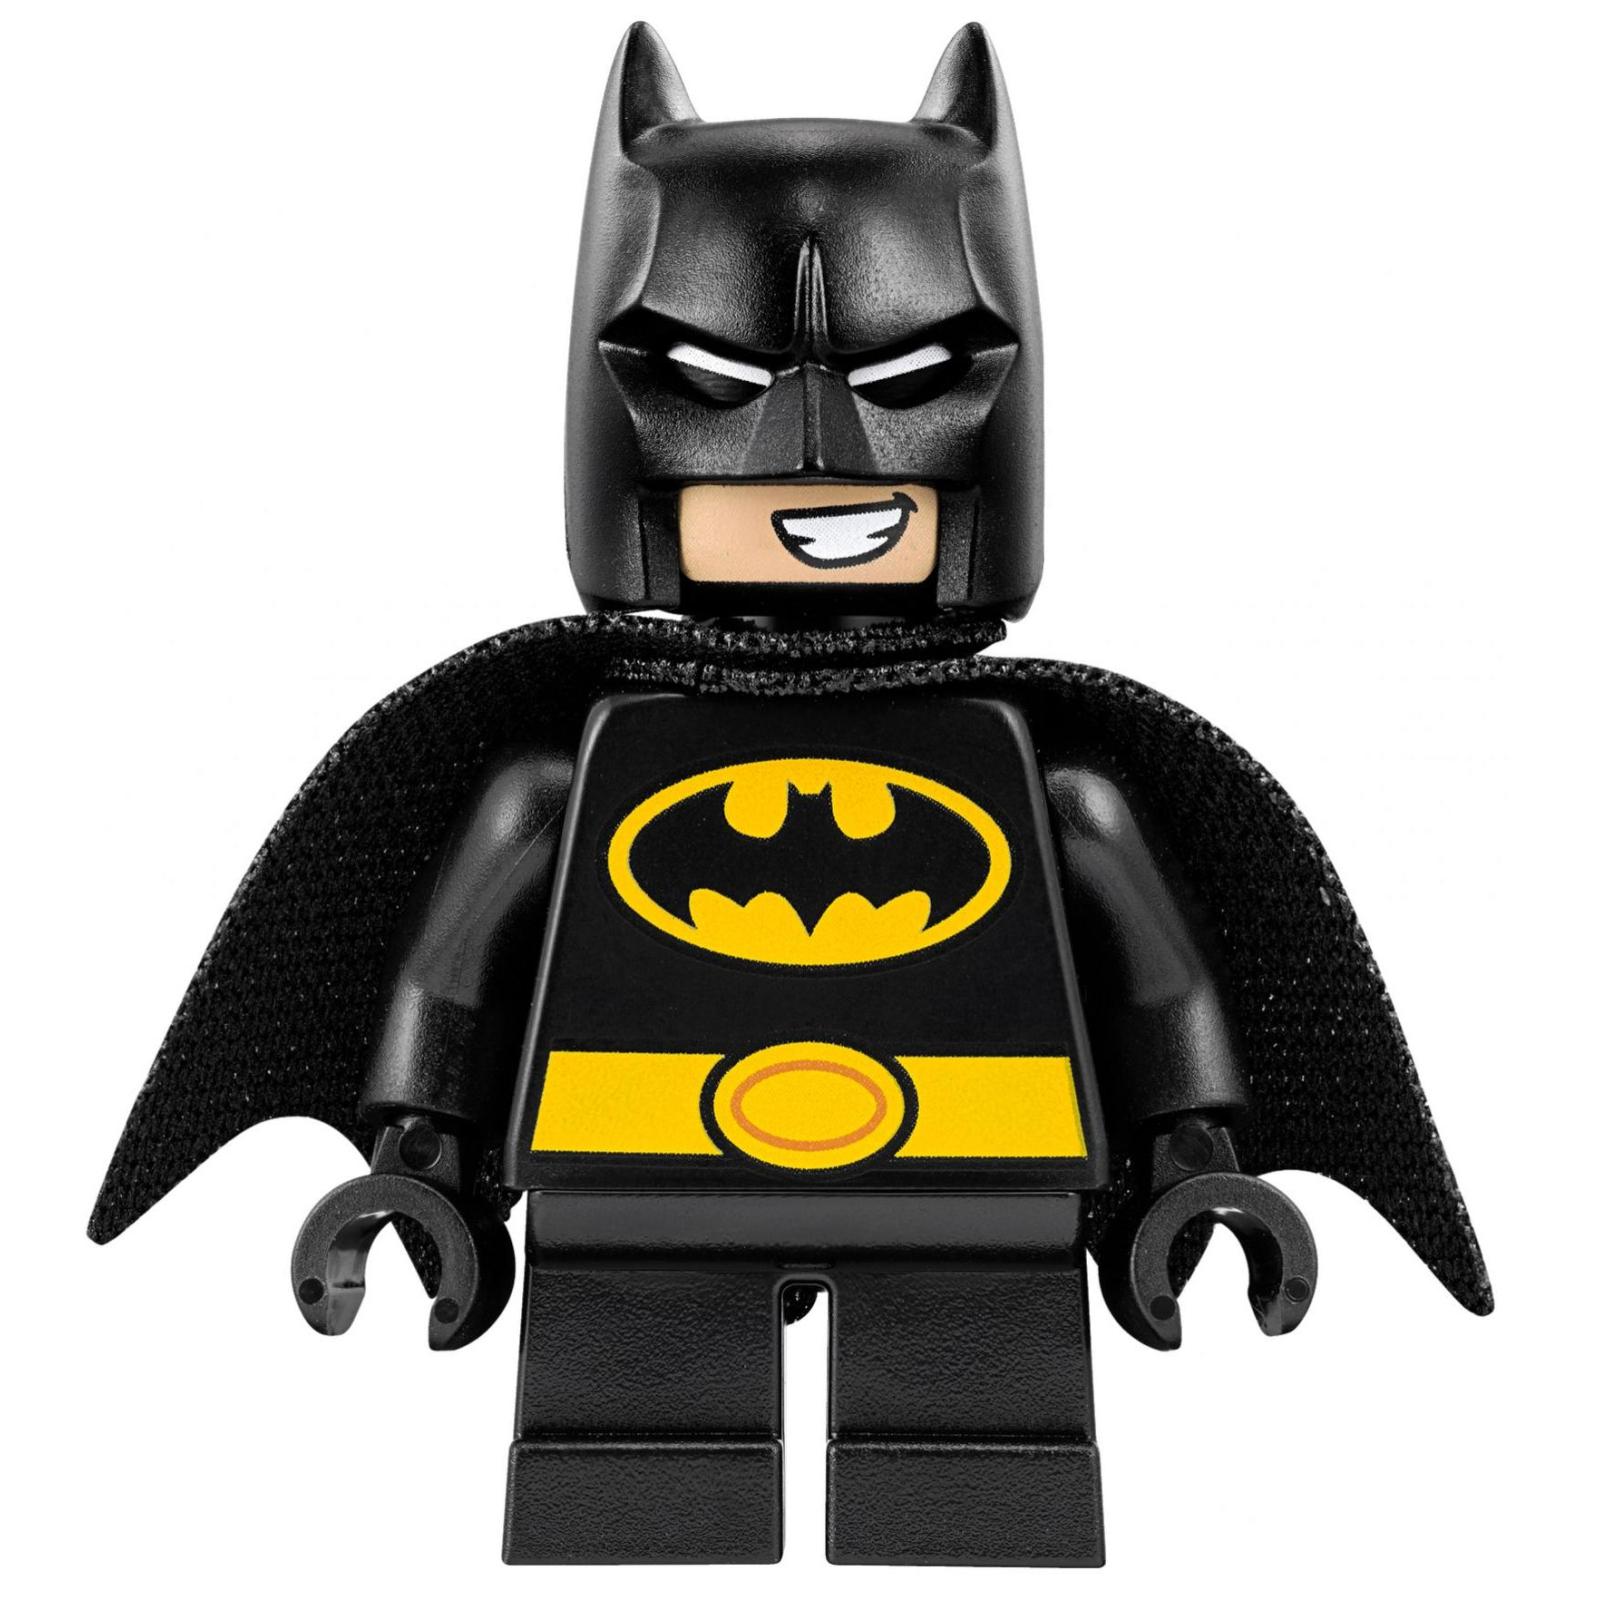 Конструктор LEGO Super Heroes Mighty Micros: Бэтмен против Харли Квин (76092) изображение 5